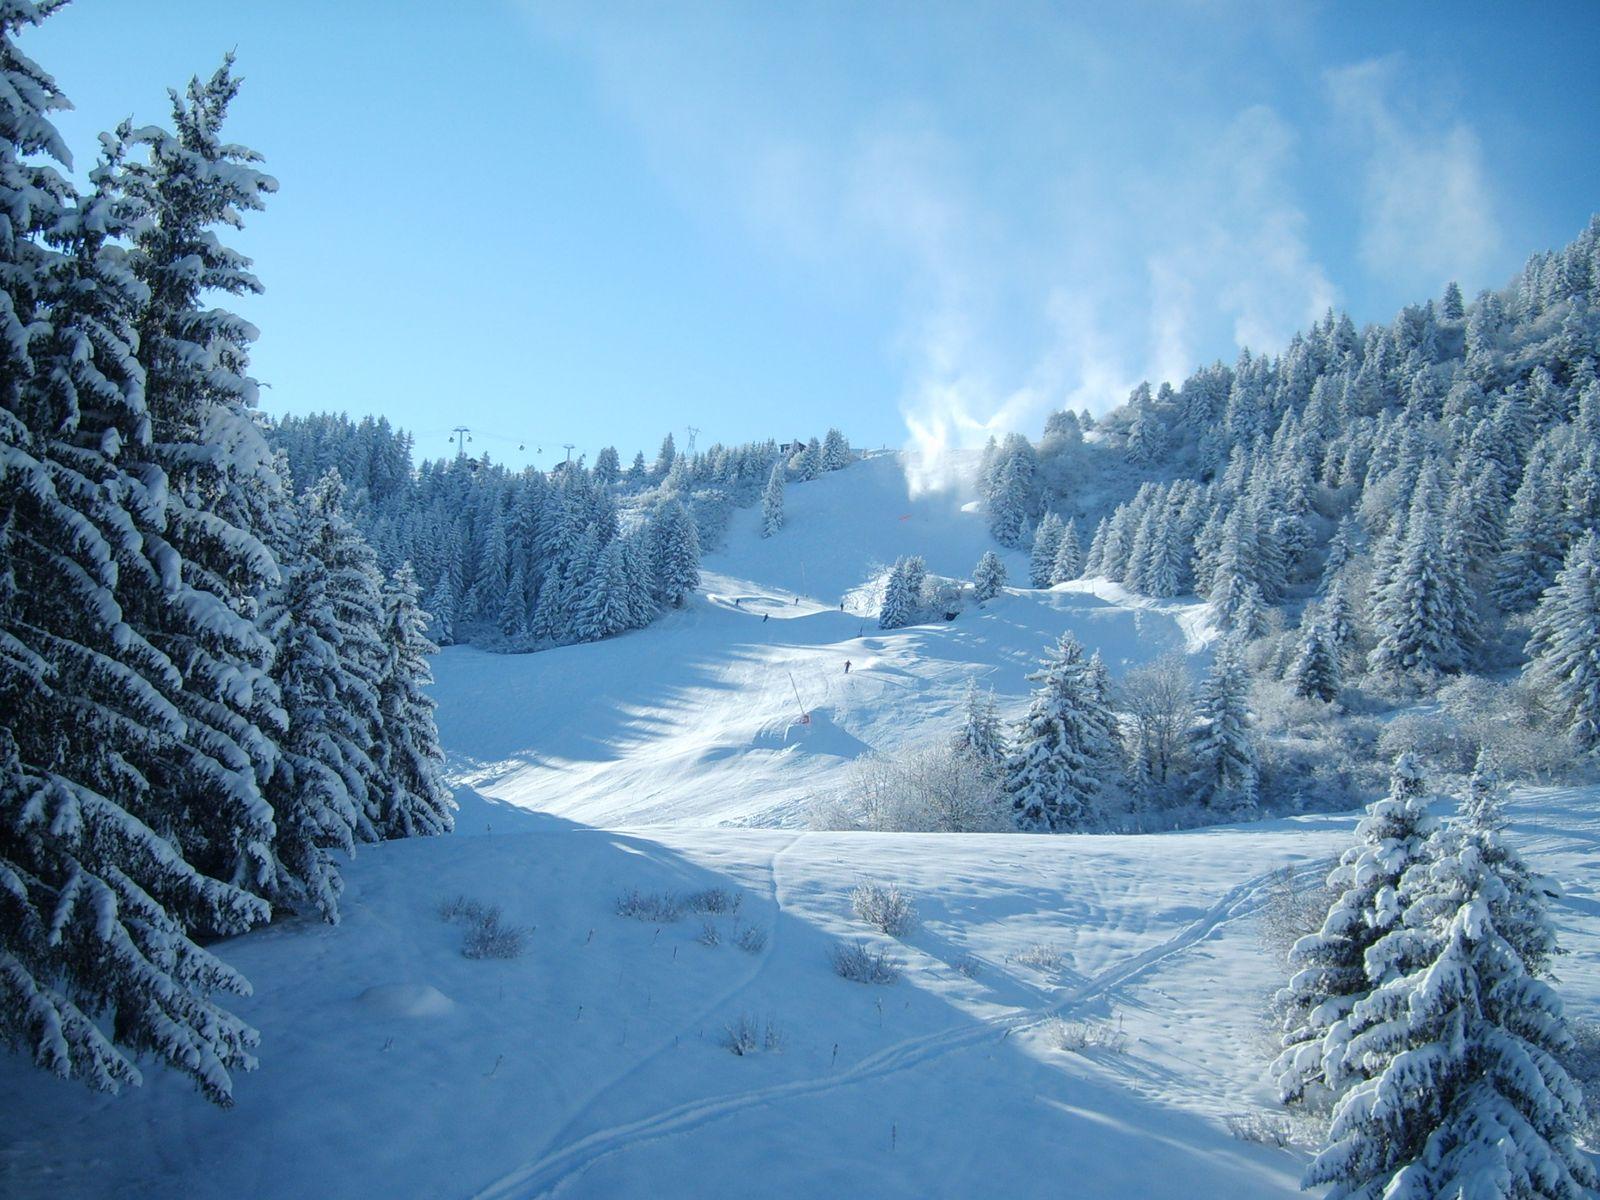 winter scenery winter wallpaper winter snowfall beautiful wallpaper 1600x1200